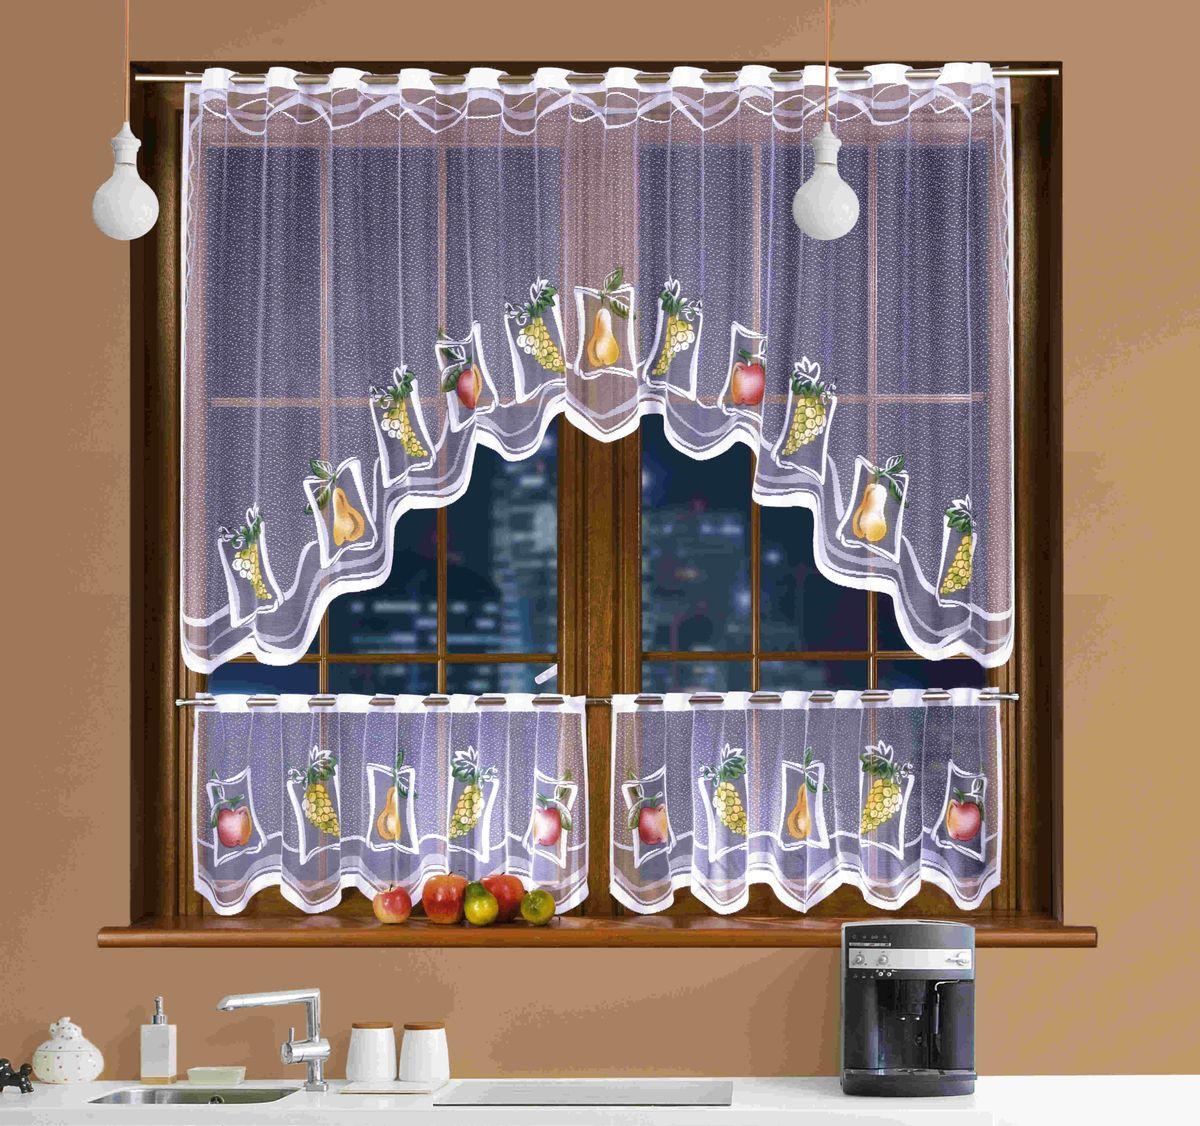 Комплект штор для кухни Wisan Martynika, на кулиске, цвет: белый, высота 250 см комплект штор для кухни wisan на ленте цвет белый черный высота 250 см 3384